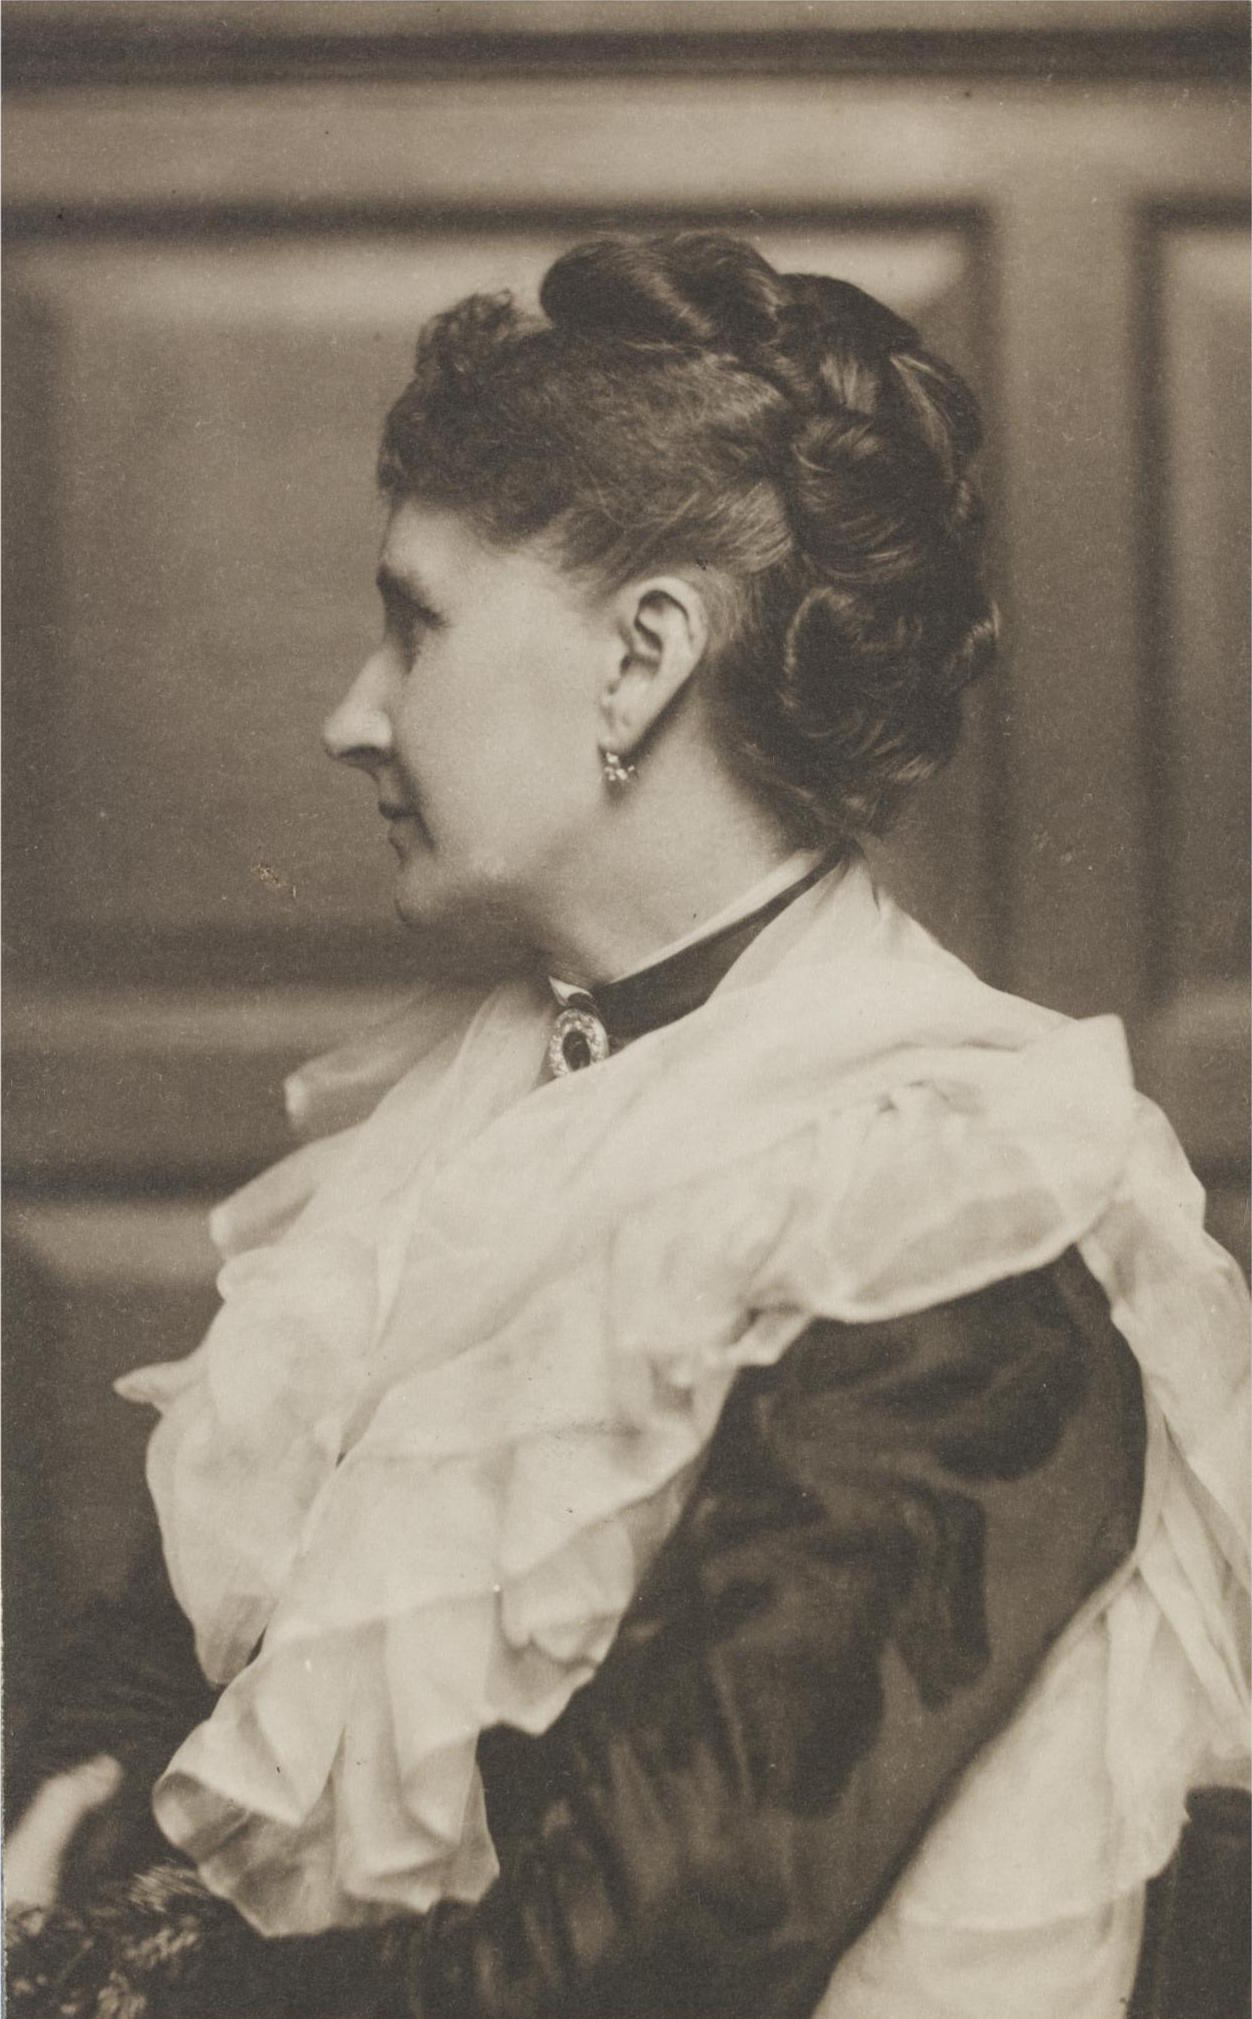 Countess Edith Lytton, ca. 1890 – costume cocktail